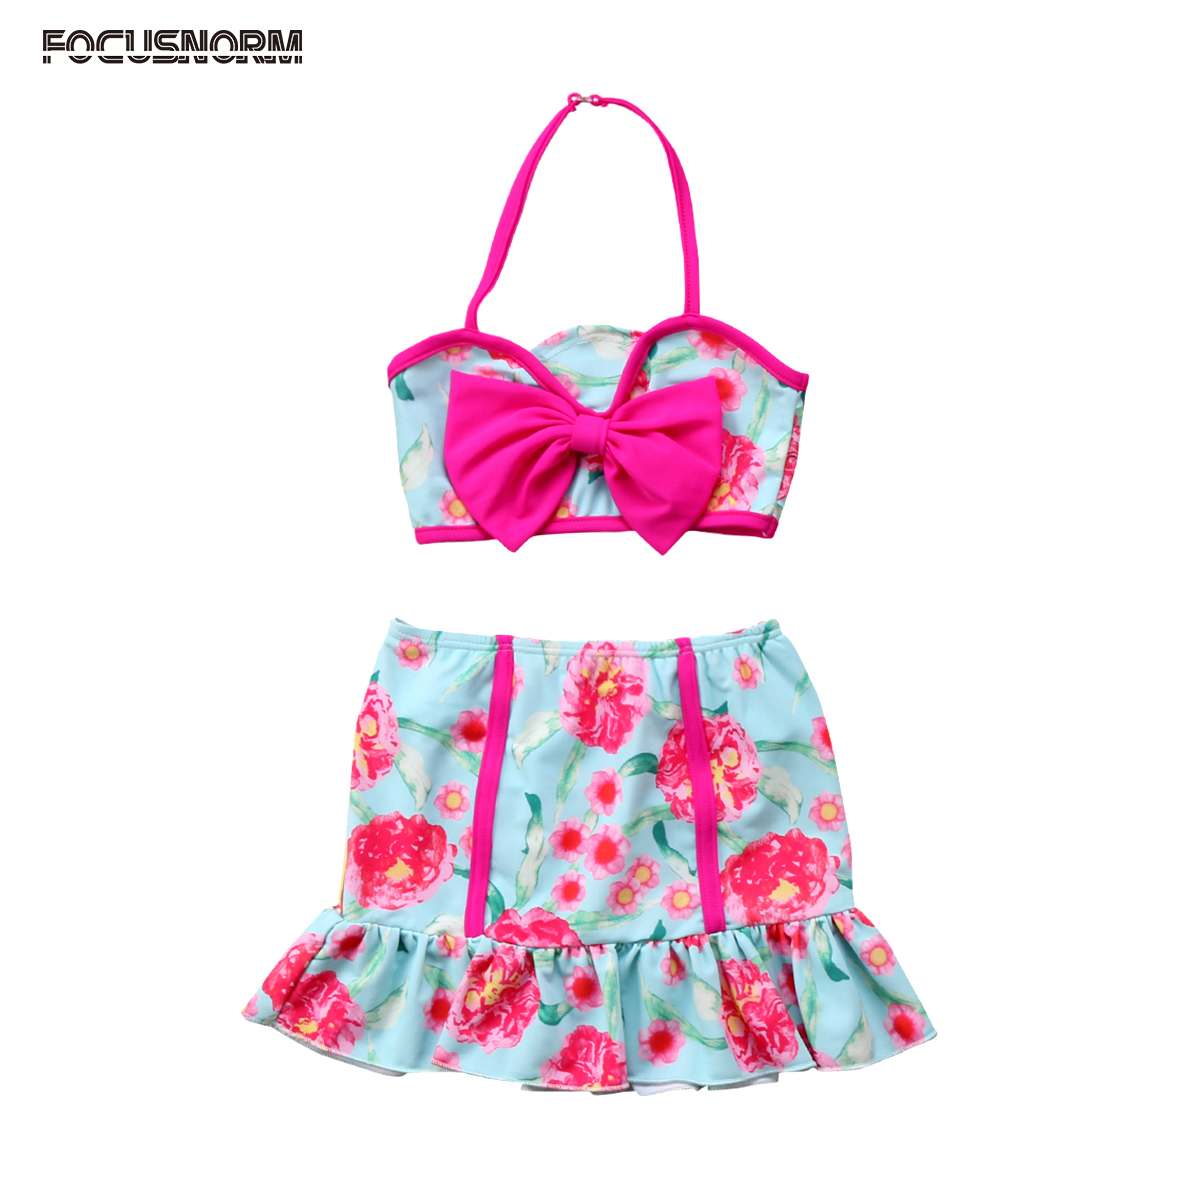 Sporting Summer Fashion Kids Girls Swimwear Bow Bikini Set Baby Crop Top + Ruffle Skirt + Long Sleeves Cove Up 3pcs Clothes Set Waterproof, Shock-Resistant And Antimagnetic